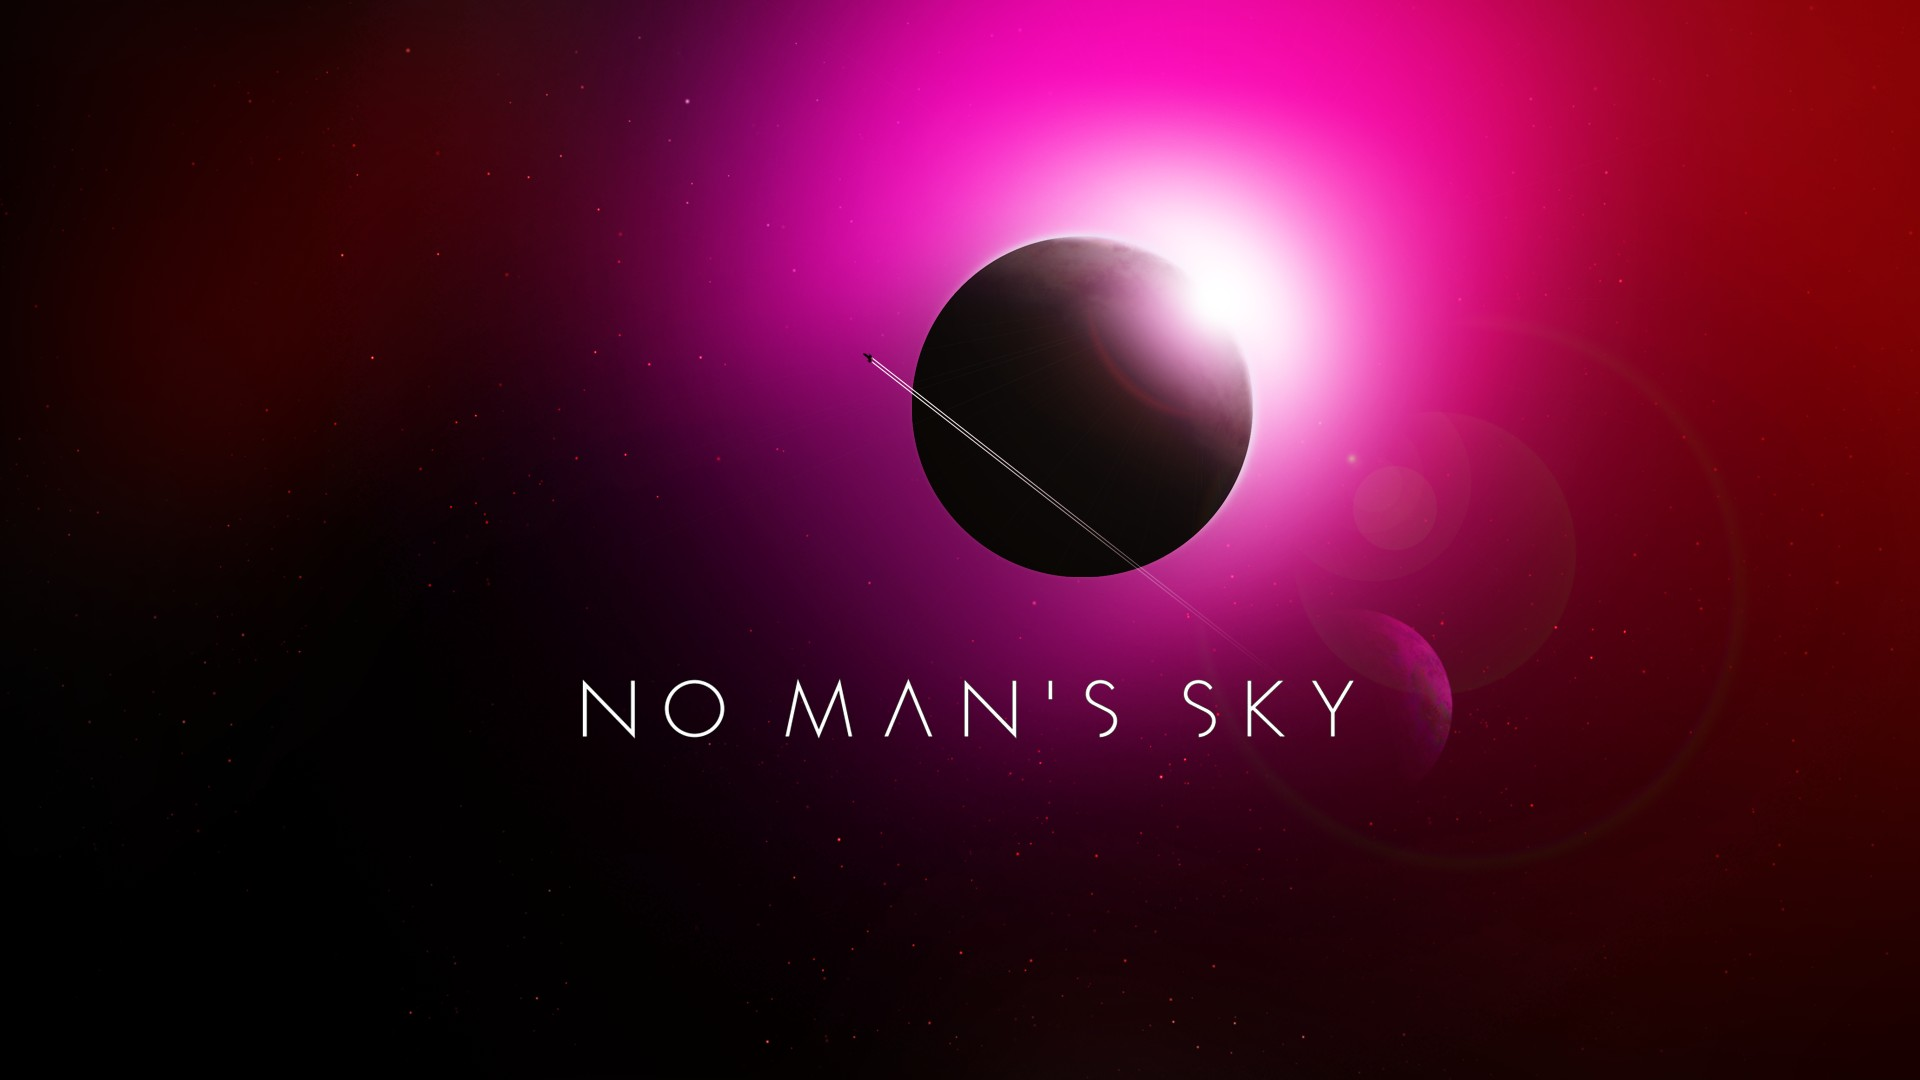 No Man S Sky Wallpaper Download Free Beautiful Full Hd